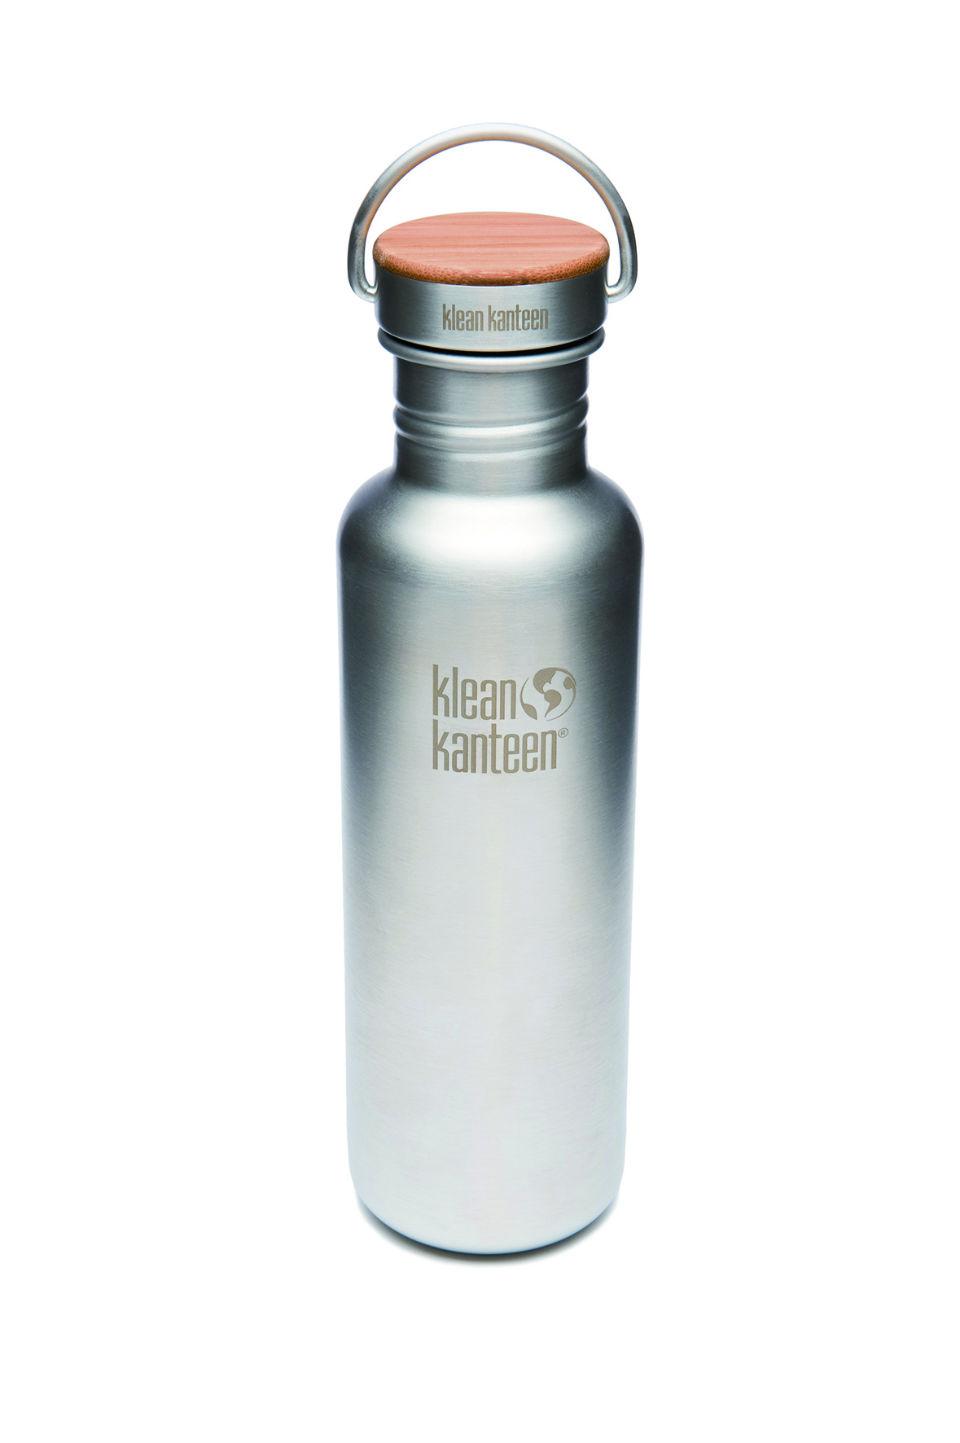 nerezová fľaša Klean Kanteen Reflect matný nerez 0.8 L - BERG SPORT 54ab8c1ab88